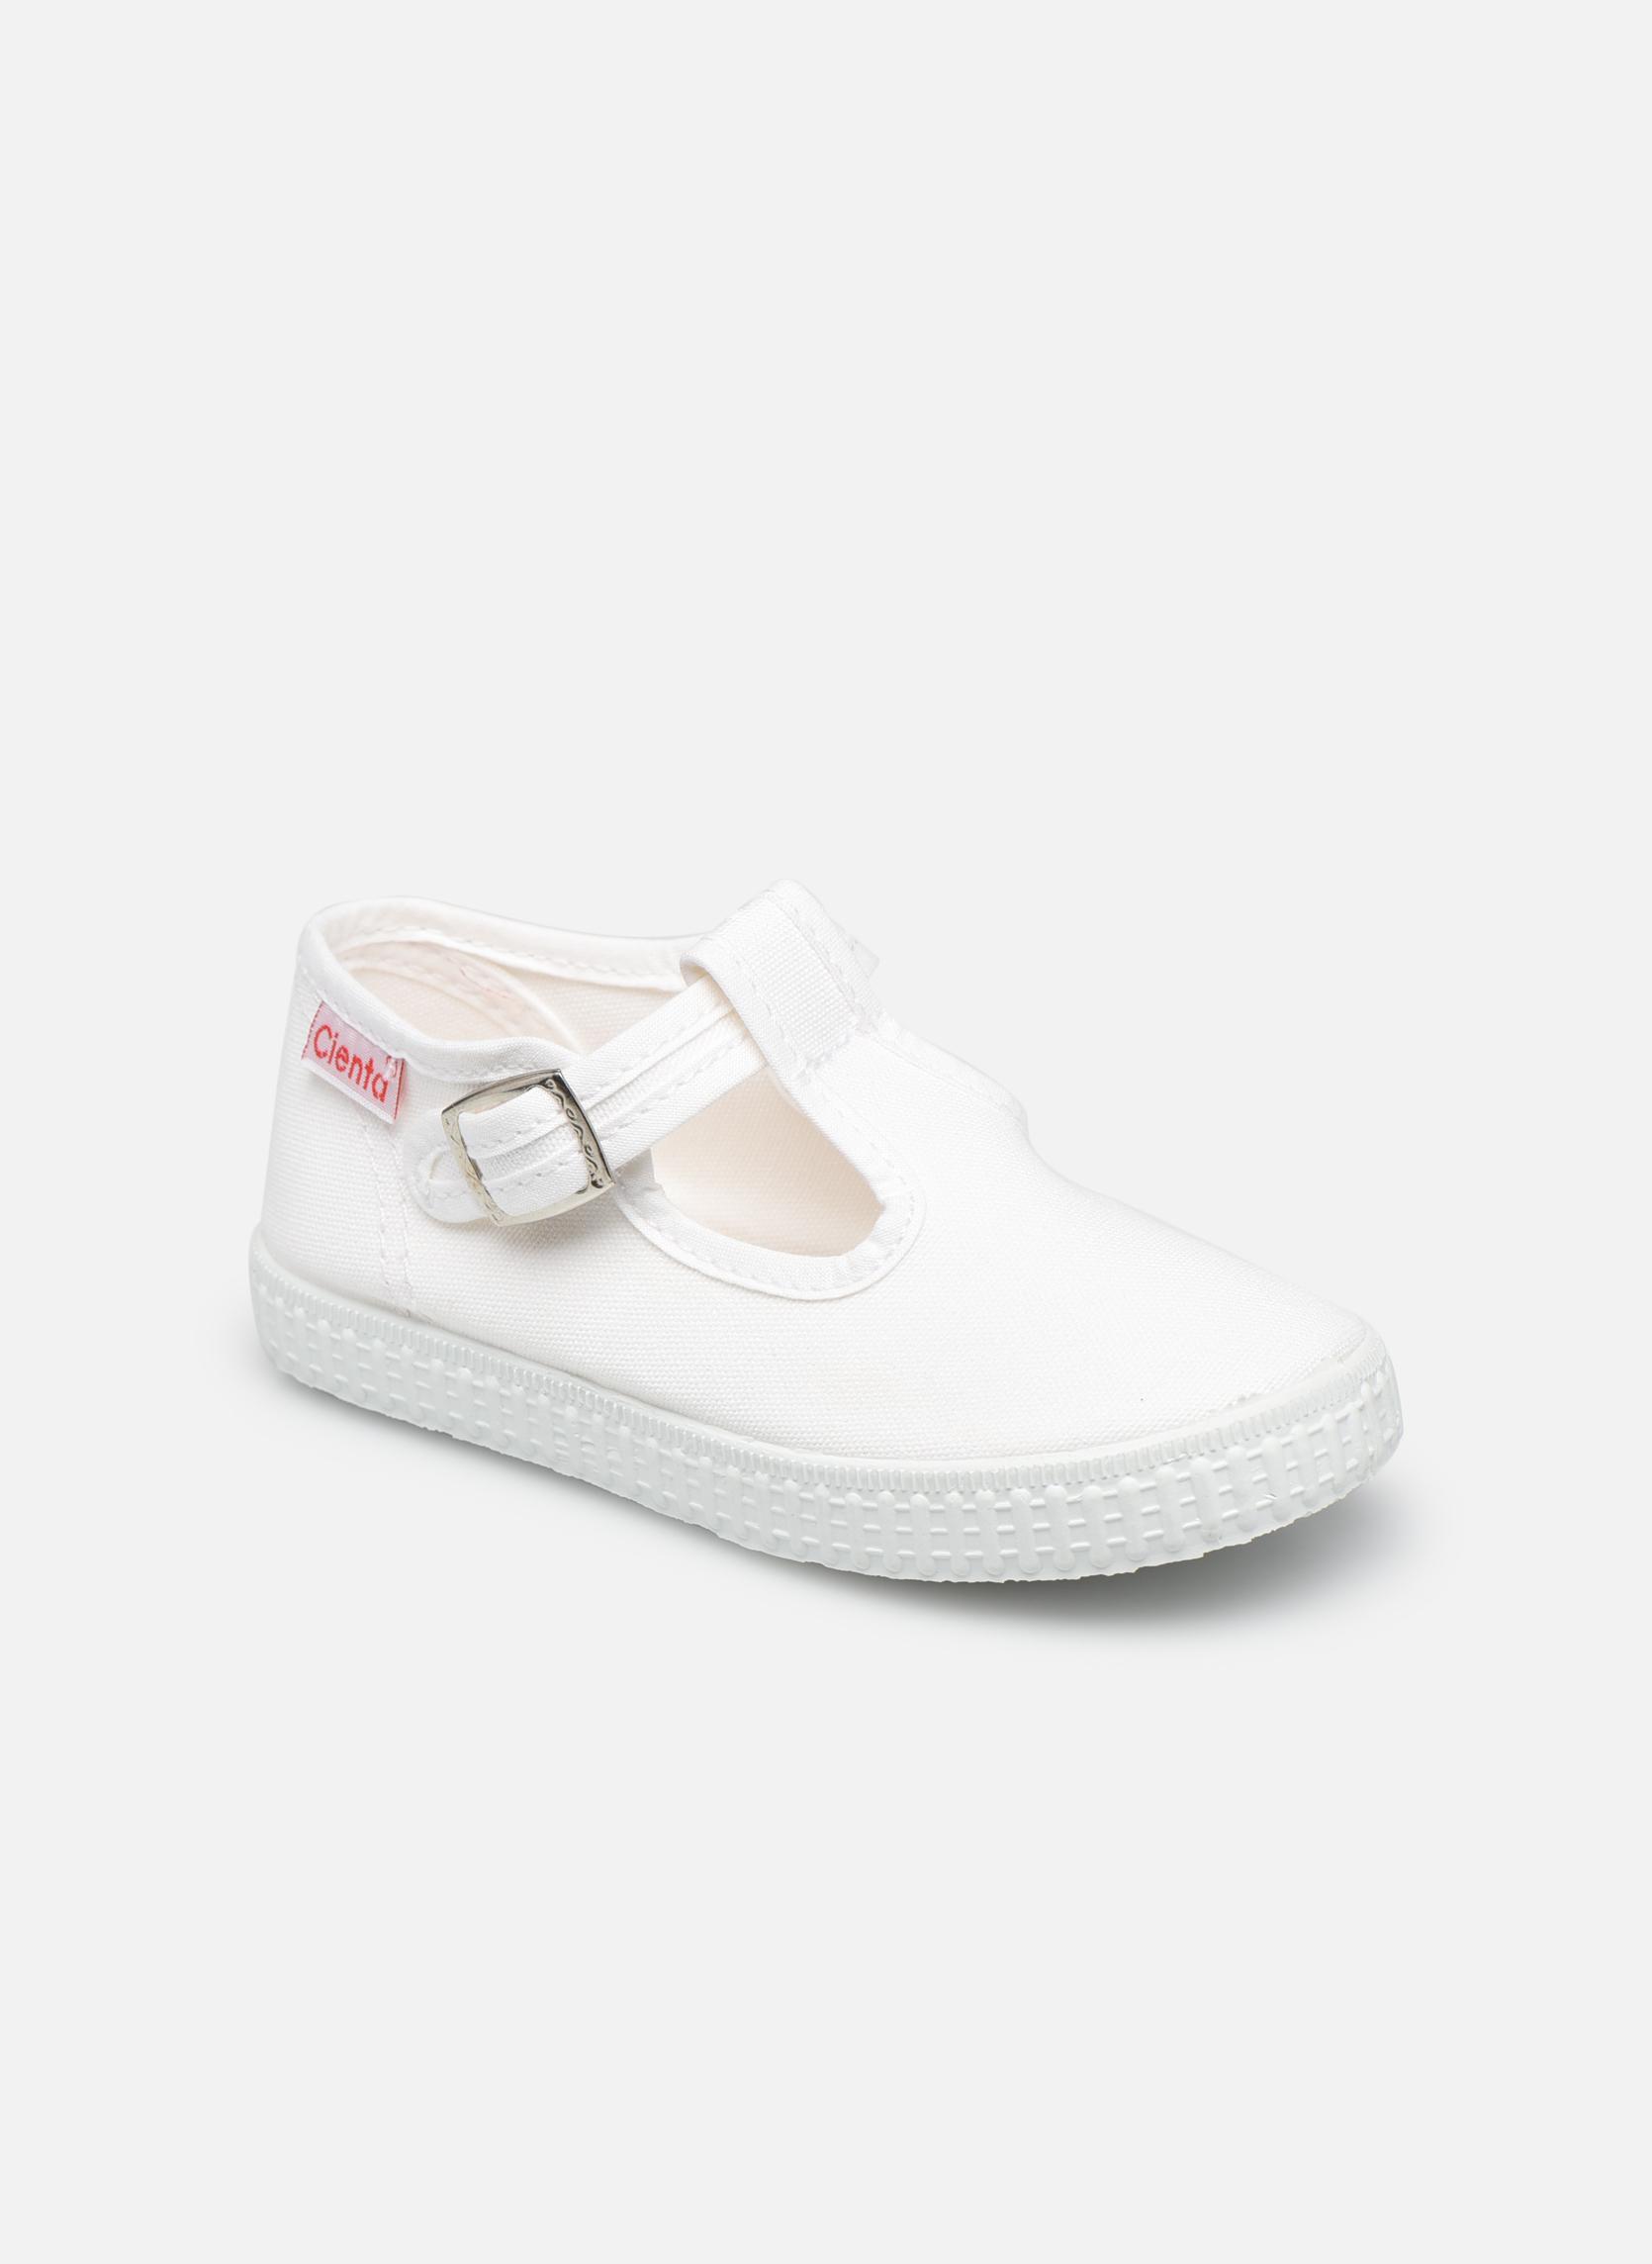 Blanc-00005